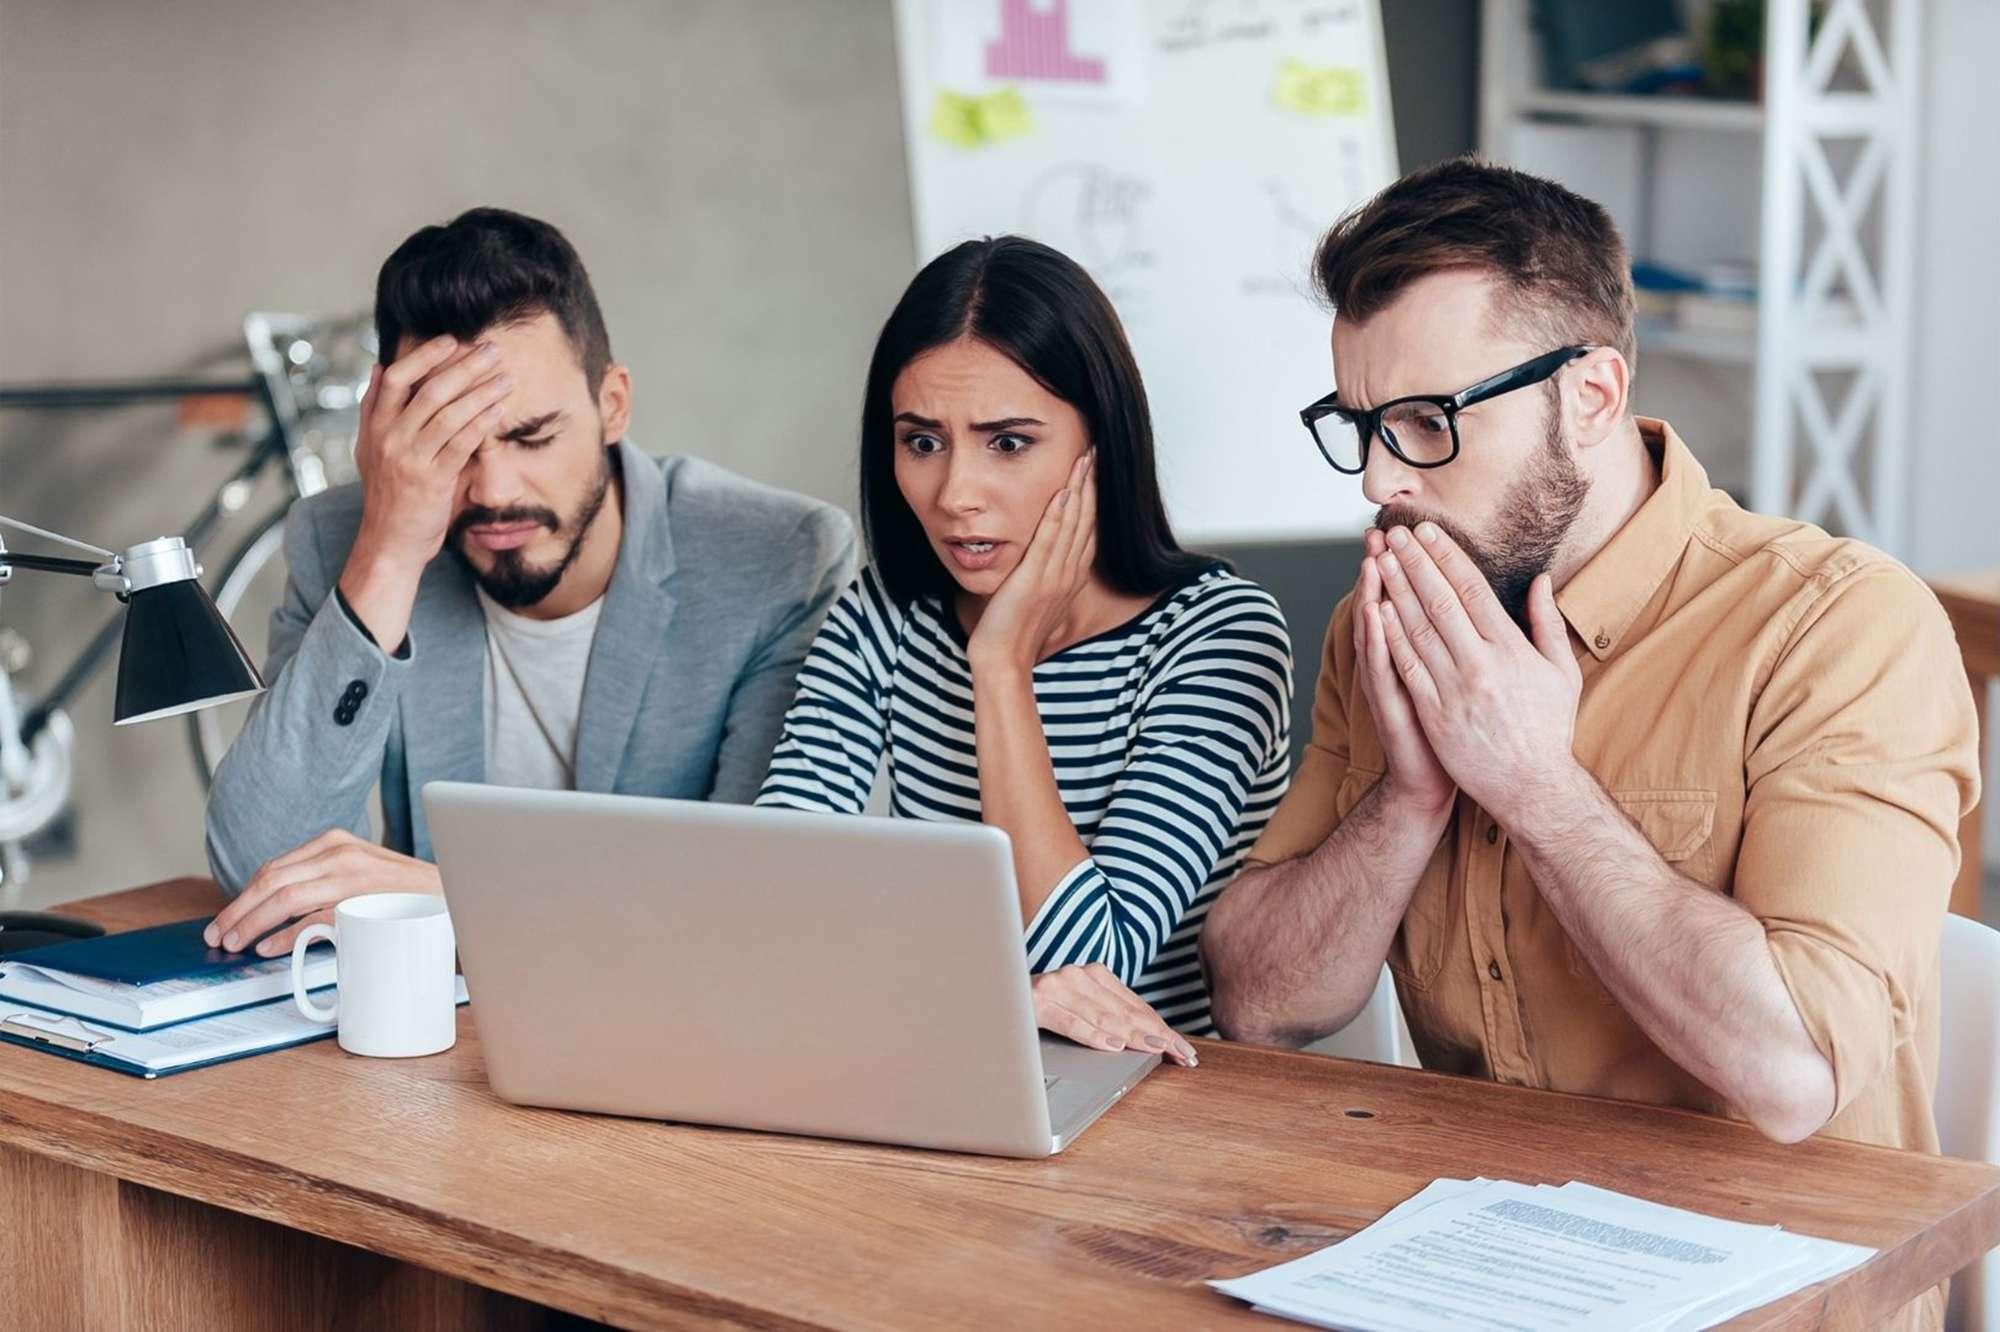 Team members looking shocked at computer monitor